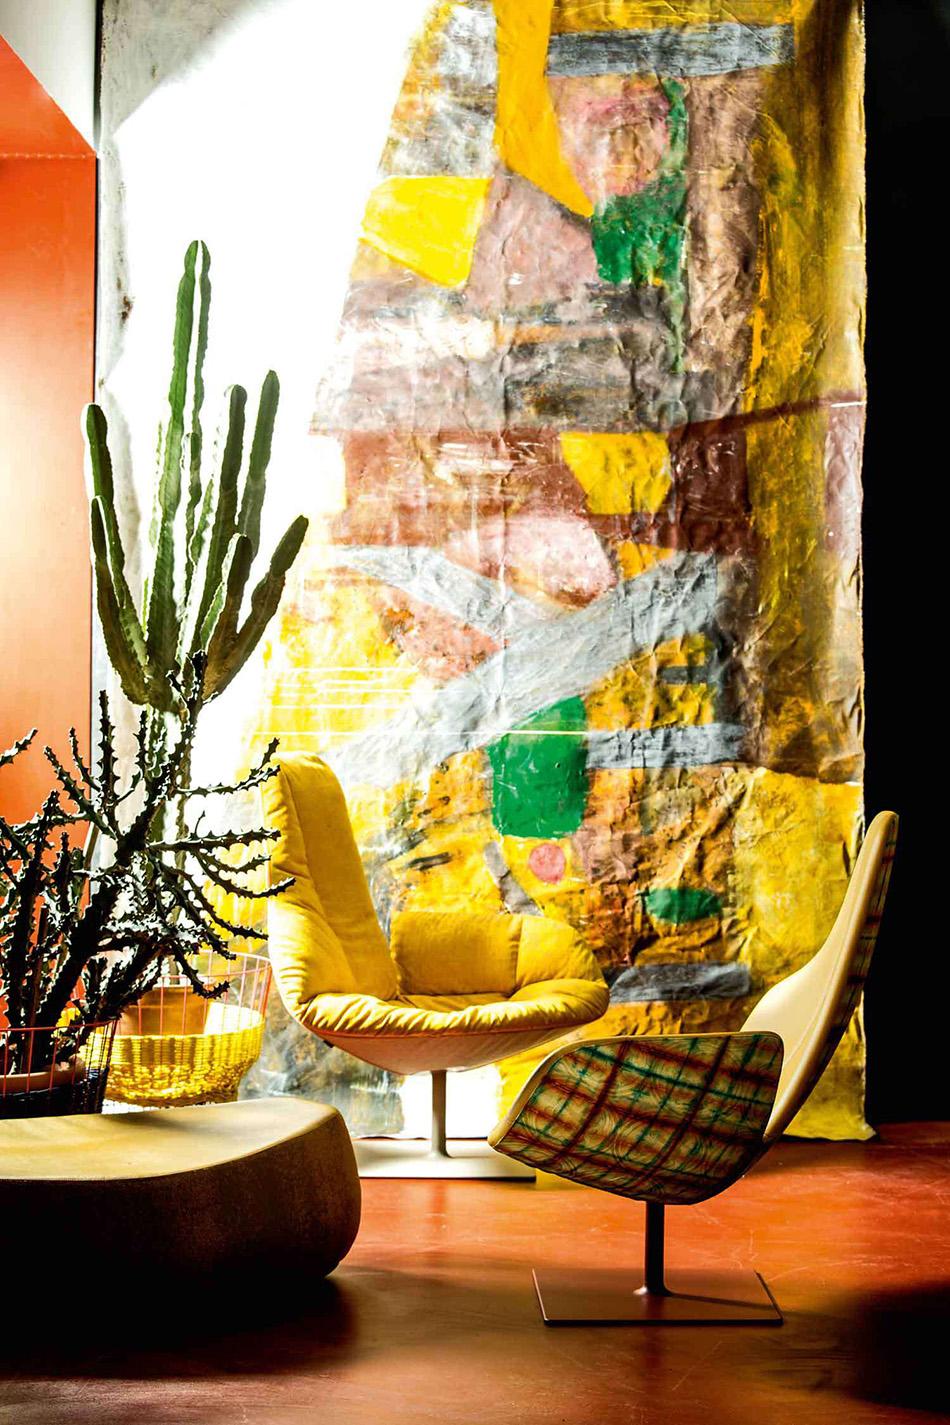 Moroso-Product-Shot-at-Patrizia-Moroso-House-Yellowtrace-13